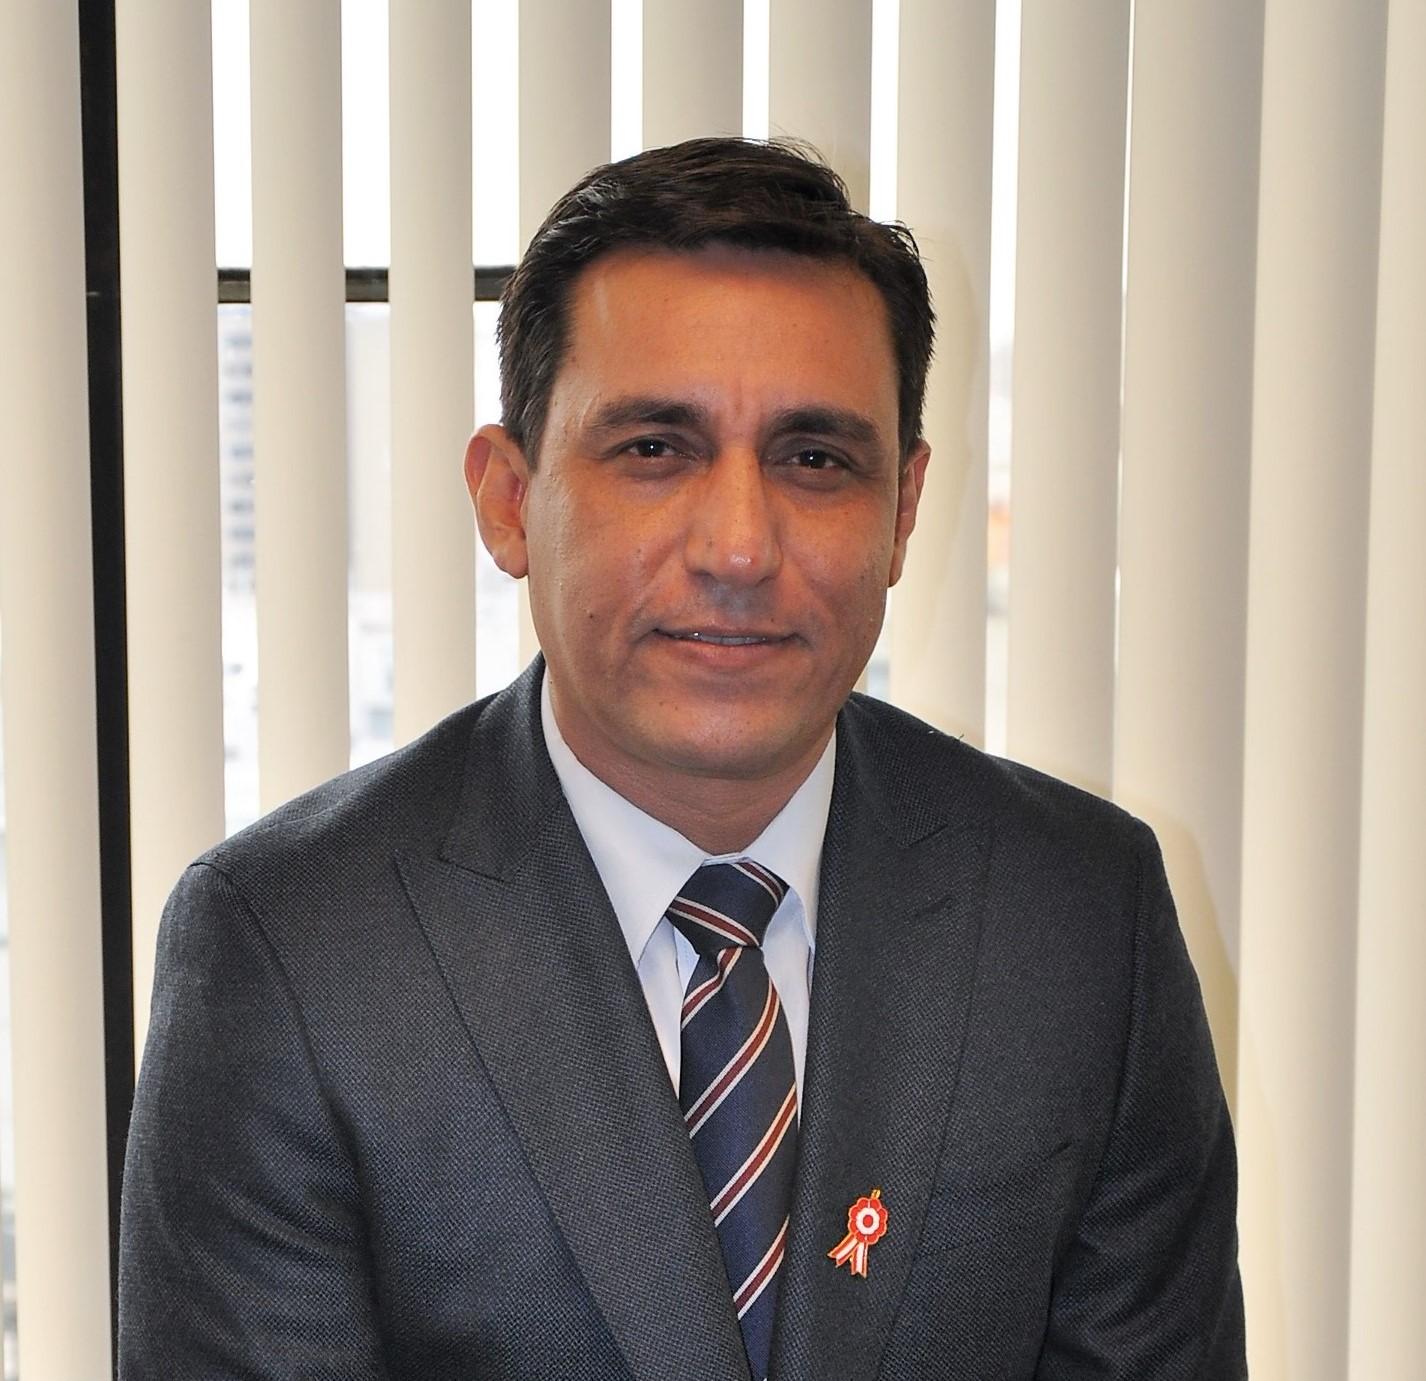 Javier Muro Rosado